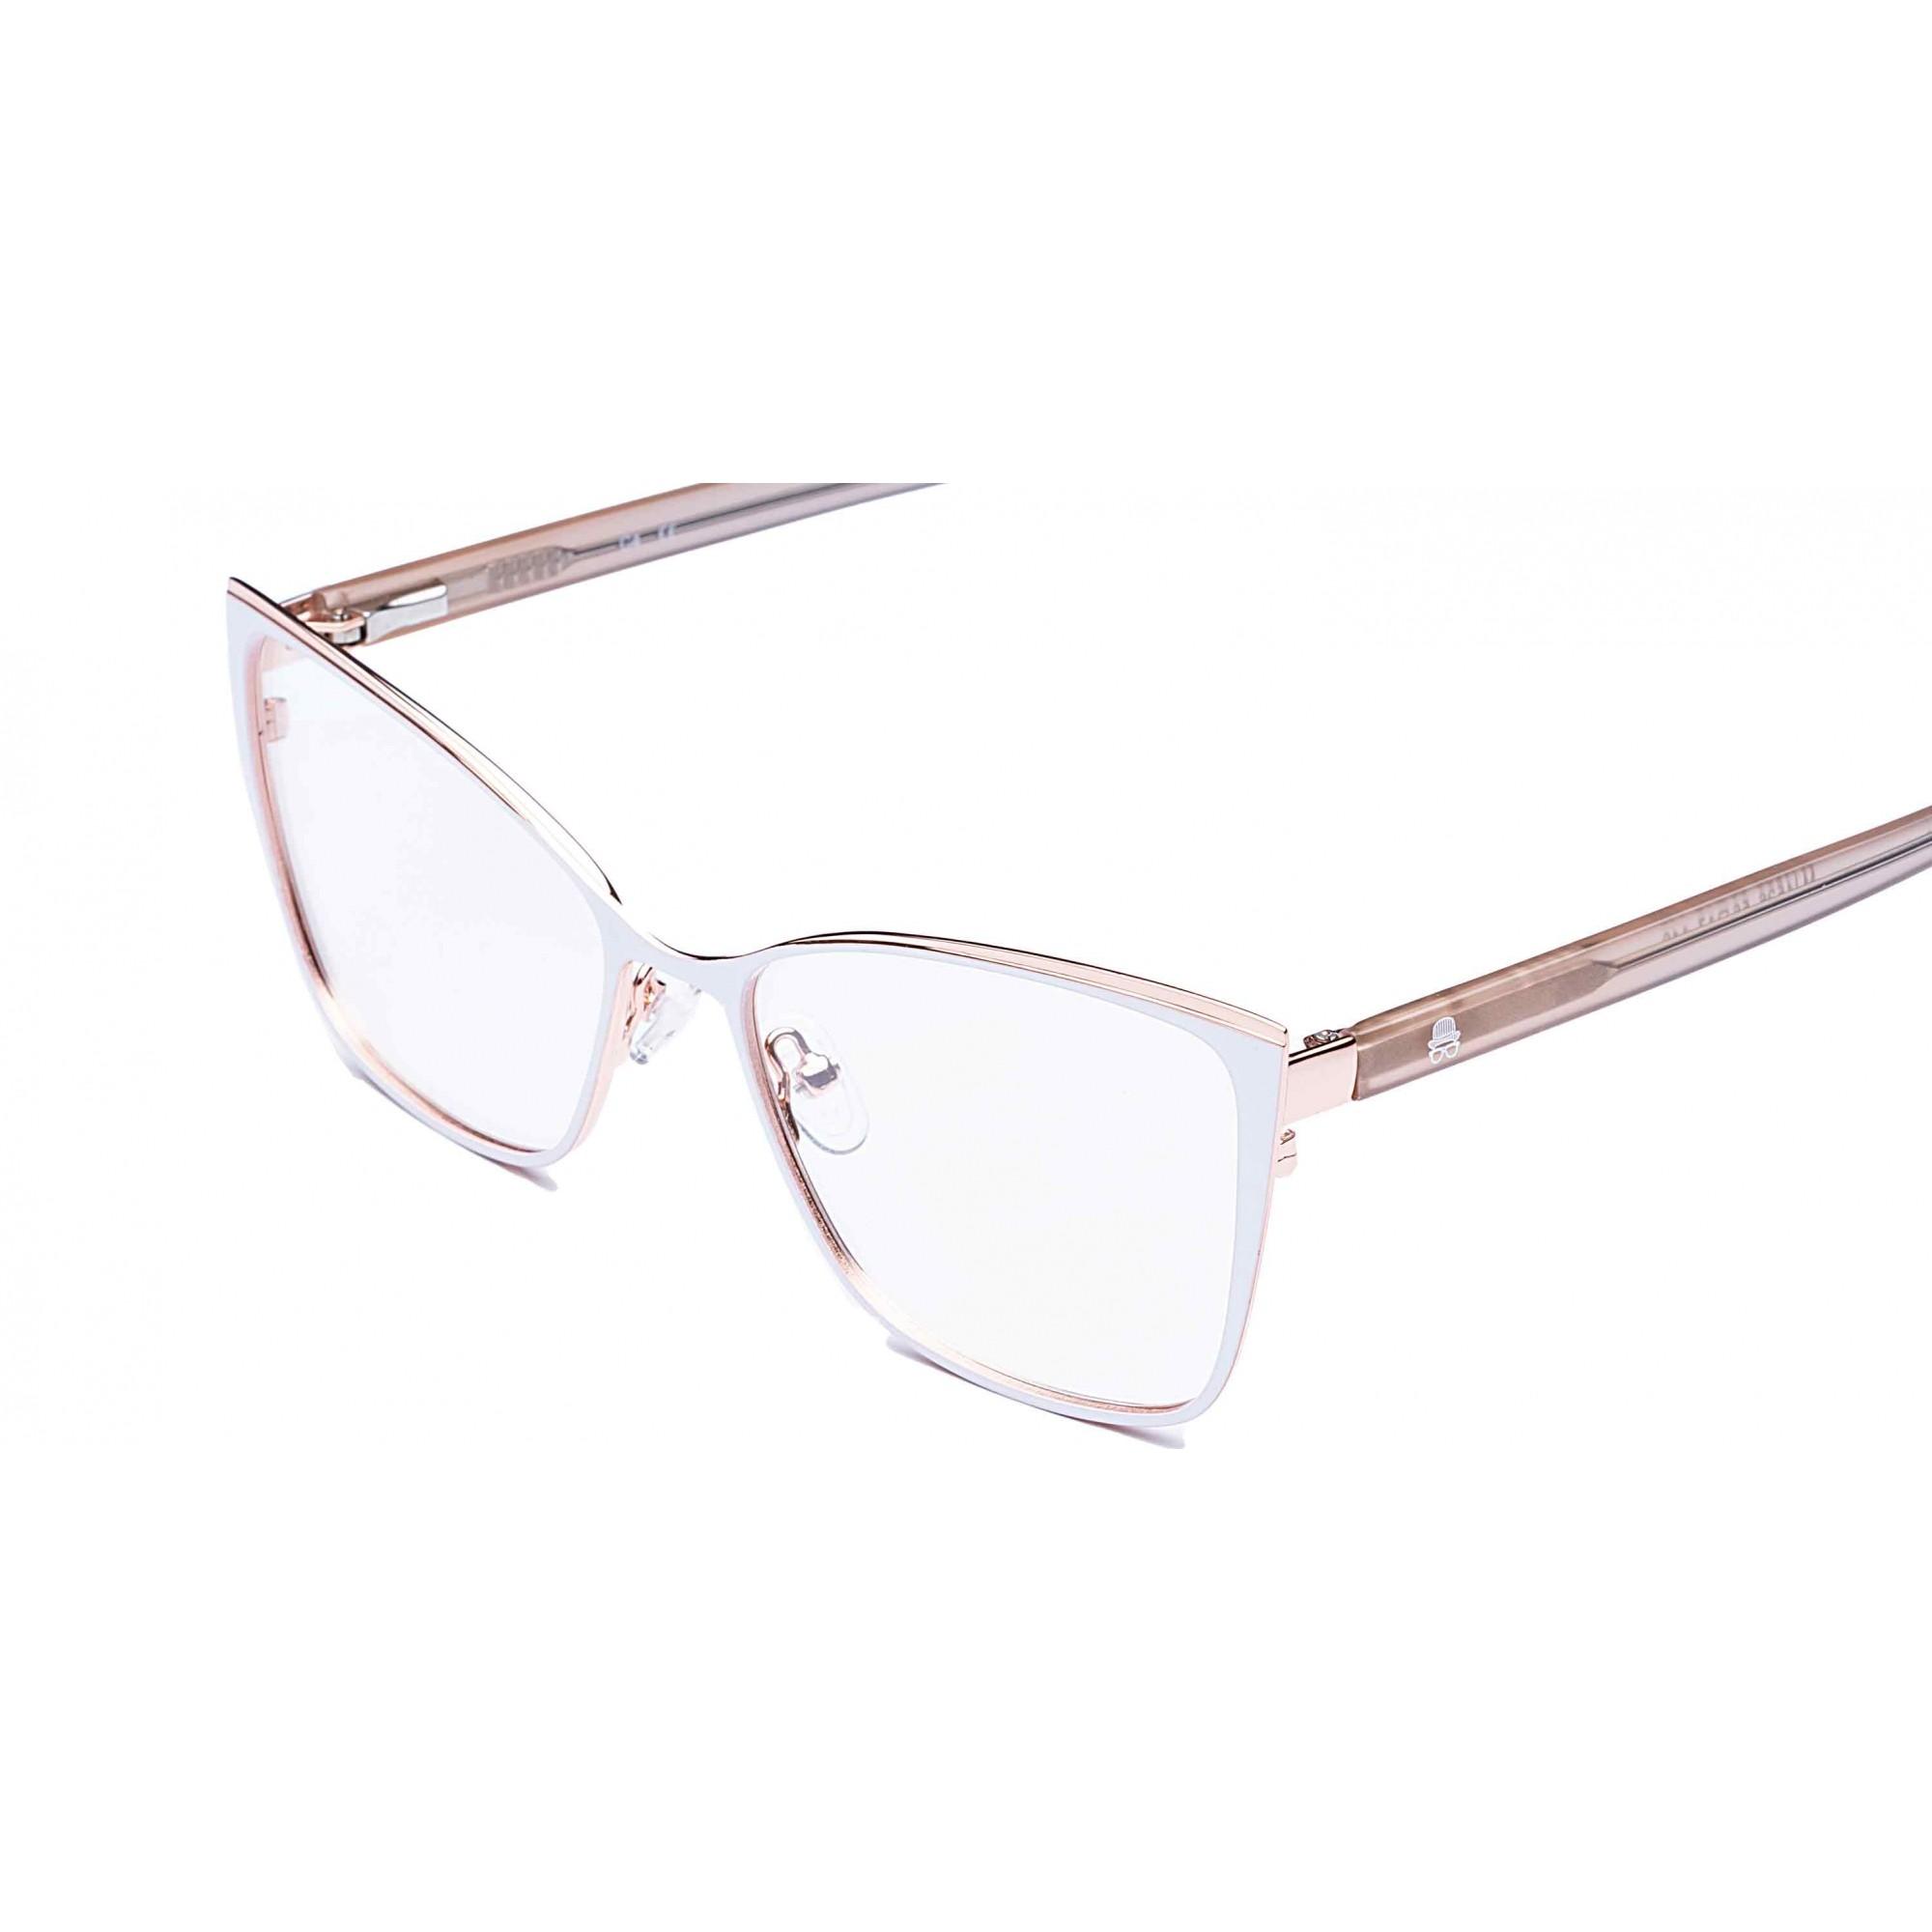 Aura - Rafael Lopes Eyewear